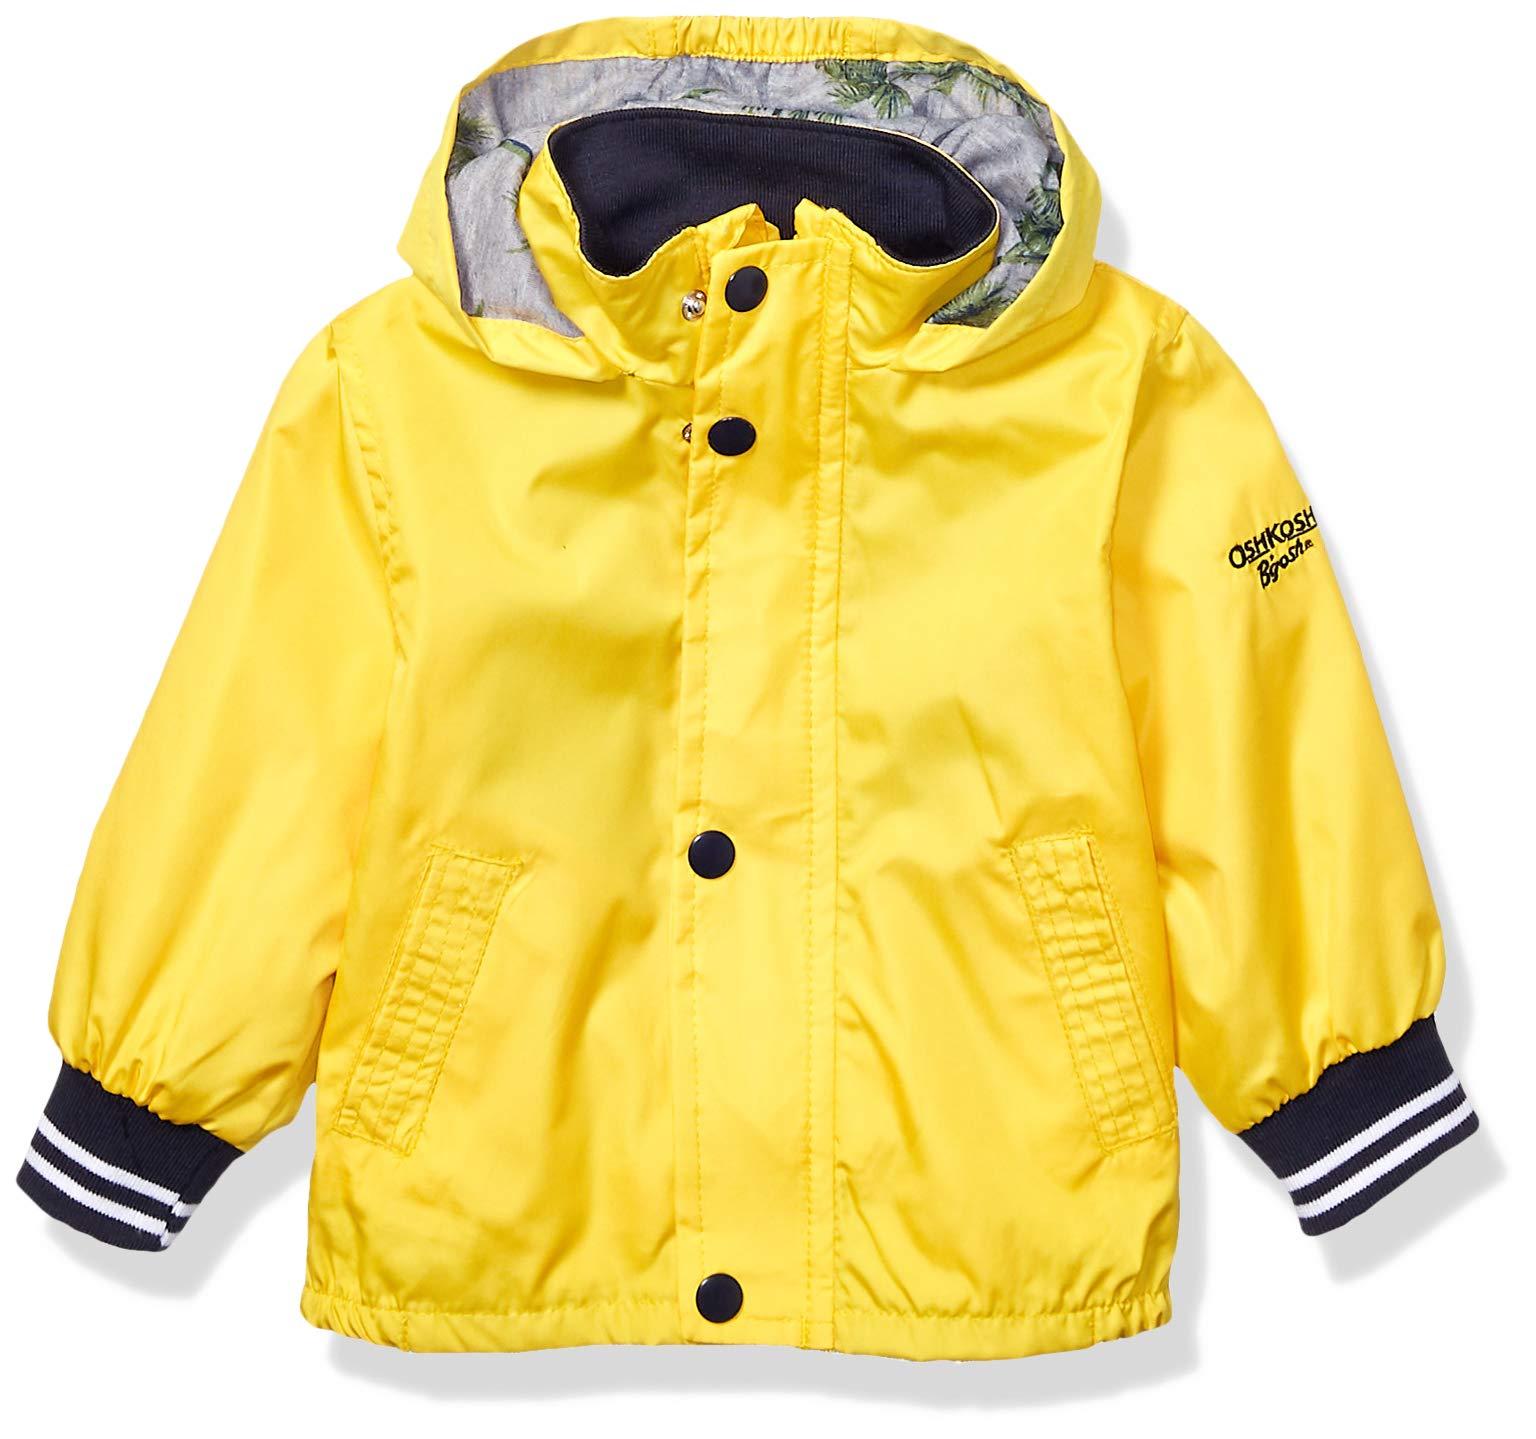 Osh Kosh Boys' Toddler Jersey Lined Bomber Jacket, Yellow, 3T